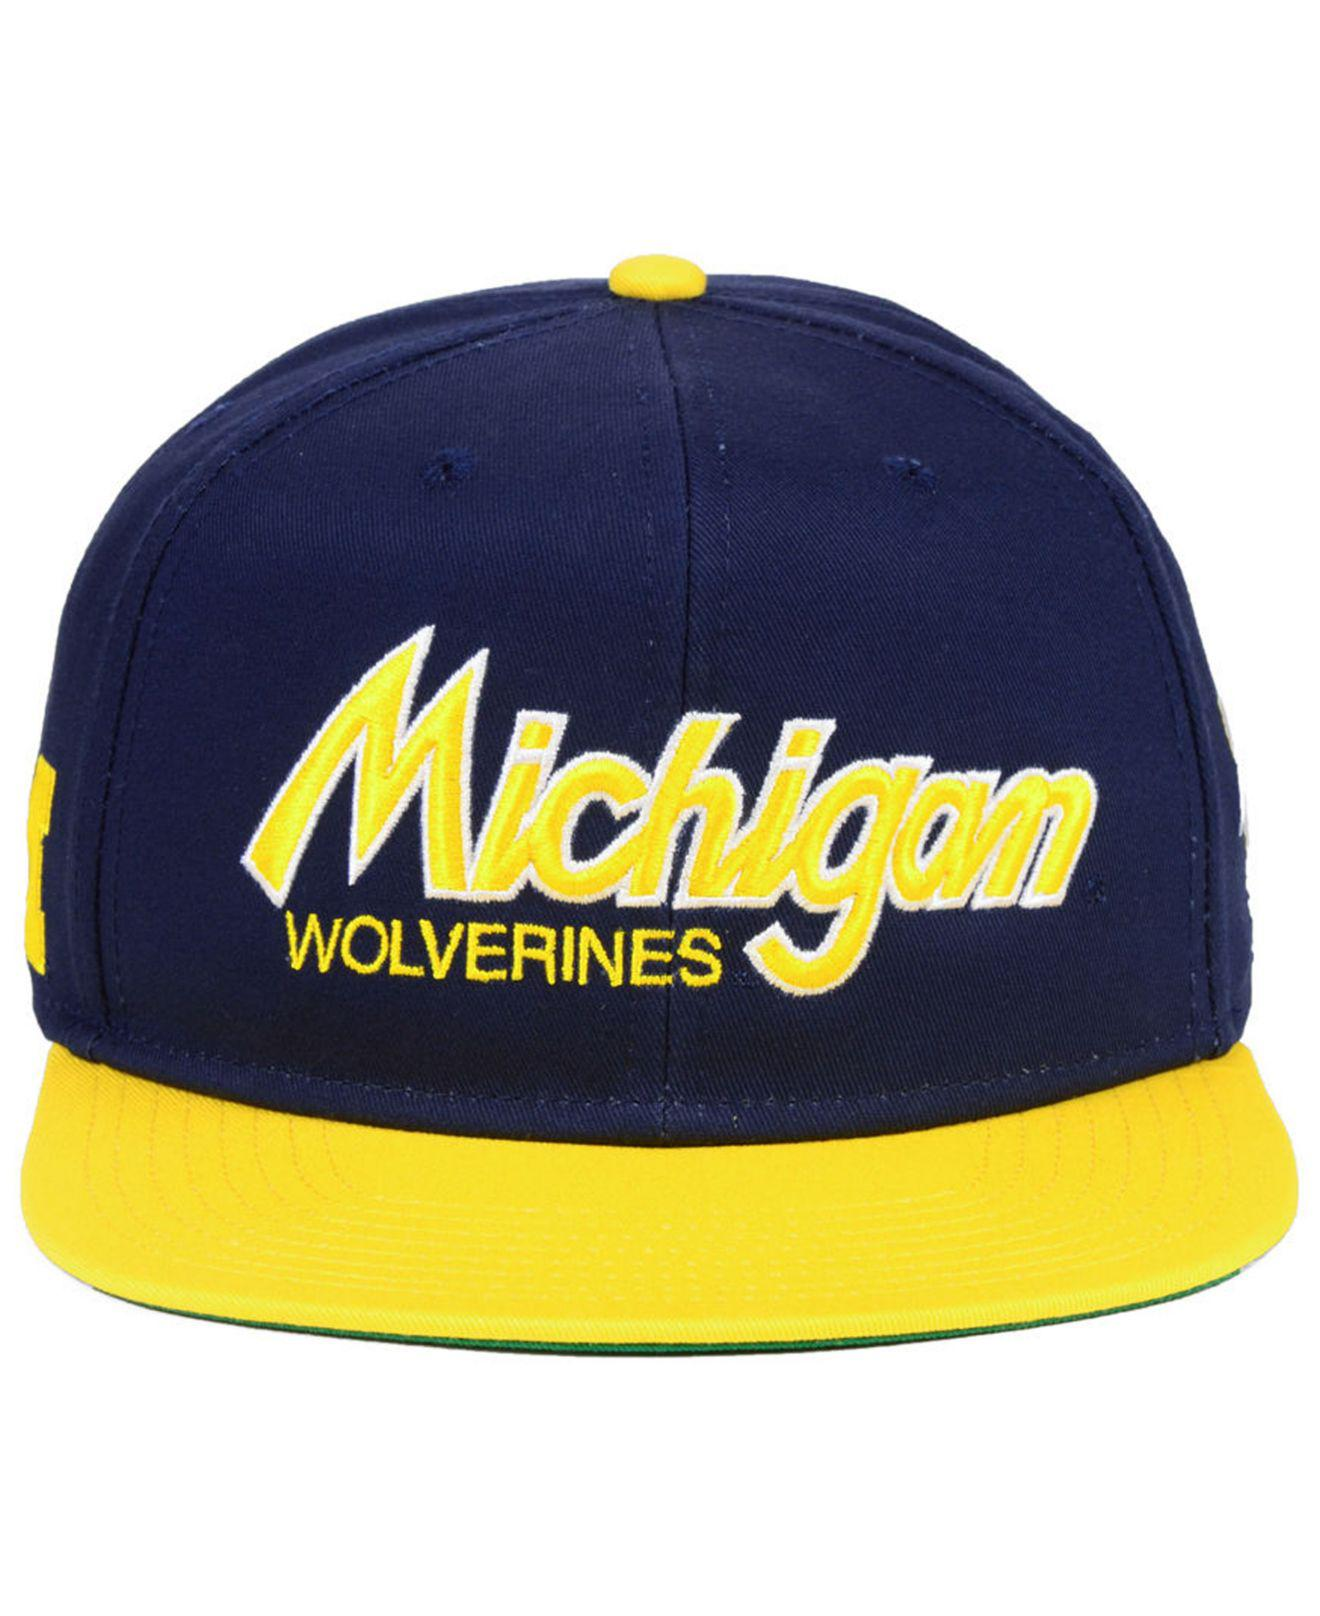 hot lyst nike michigan wolverines sport specialties snapback cap in blue for  men 3d97b 8e16e 891b08846054